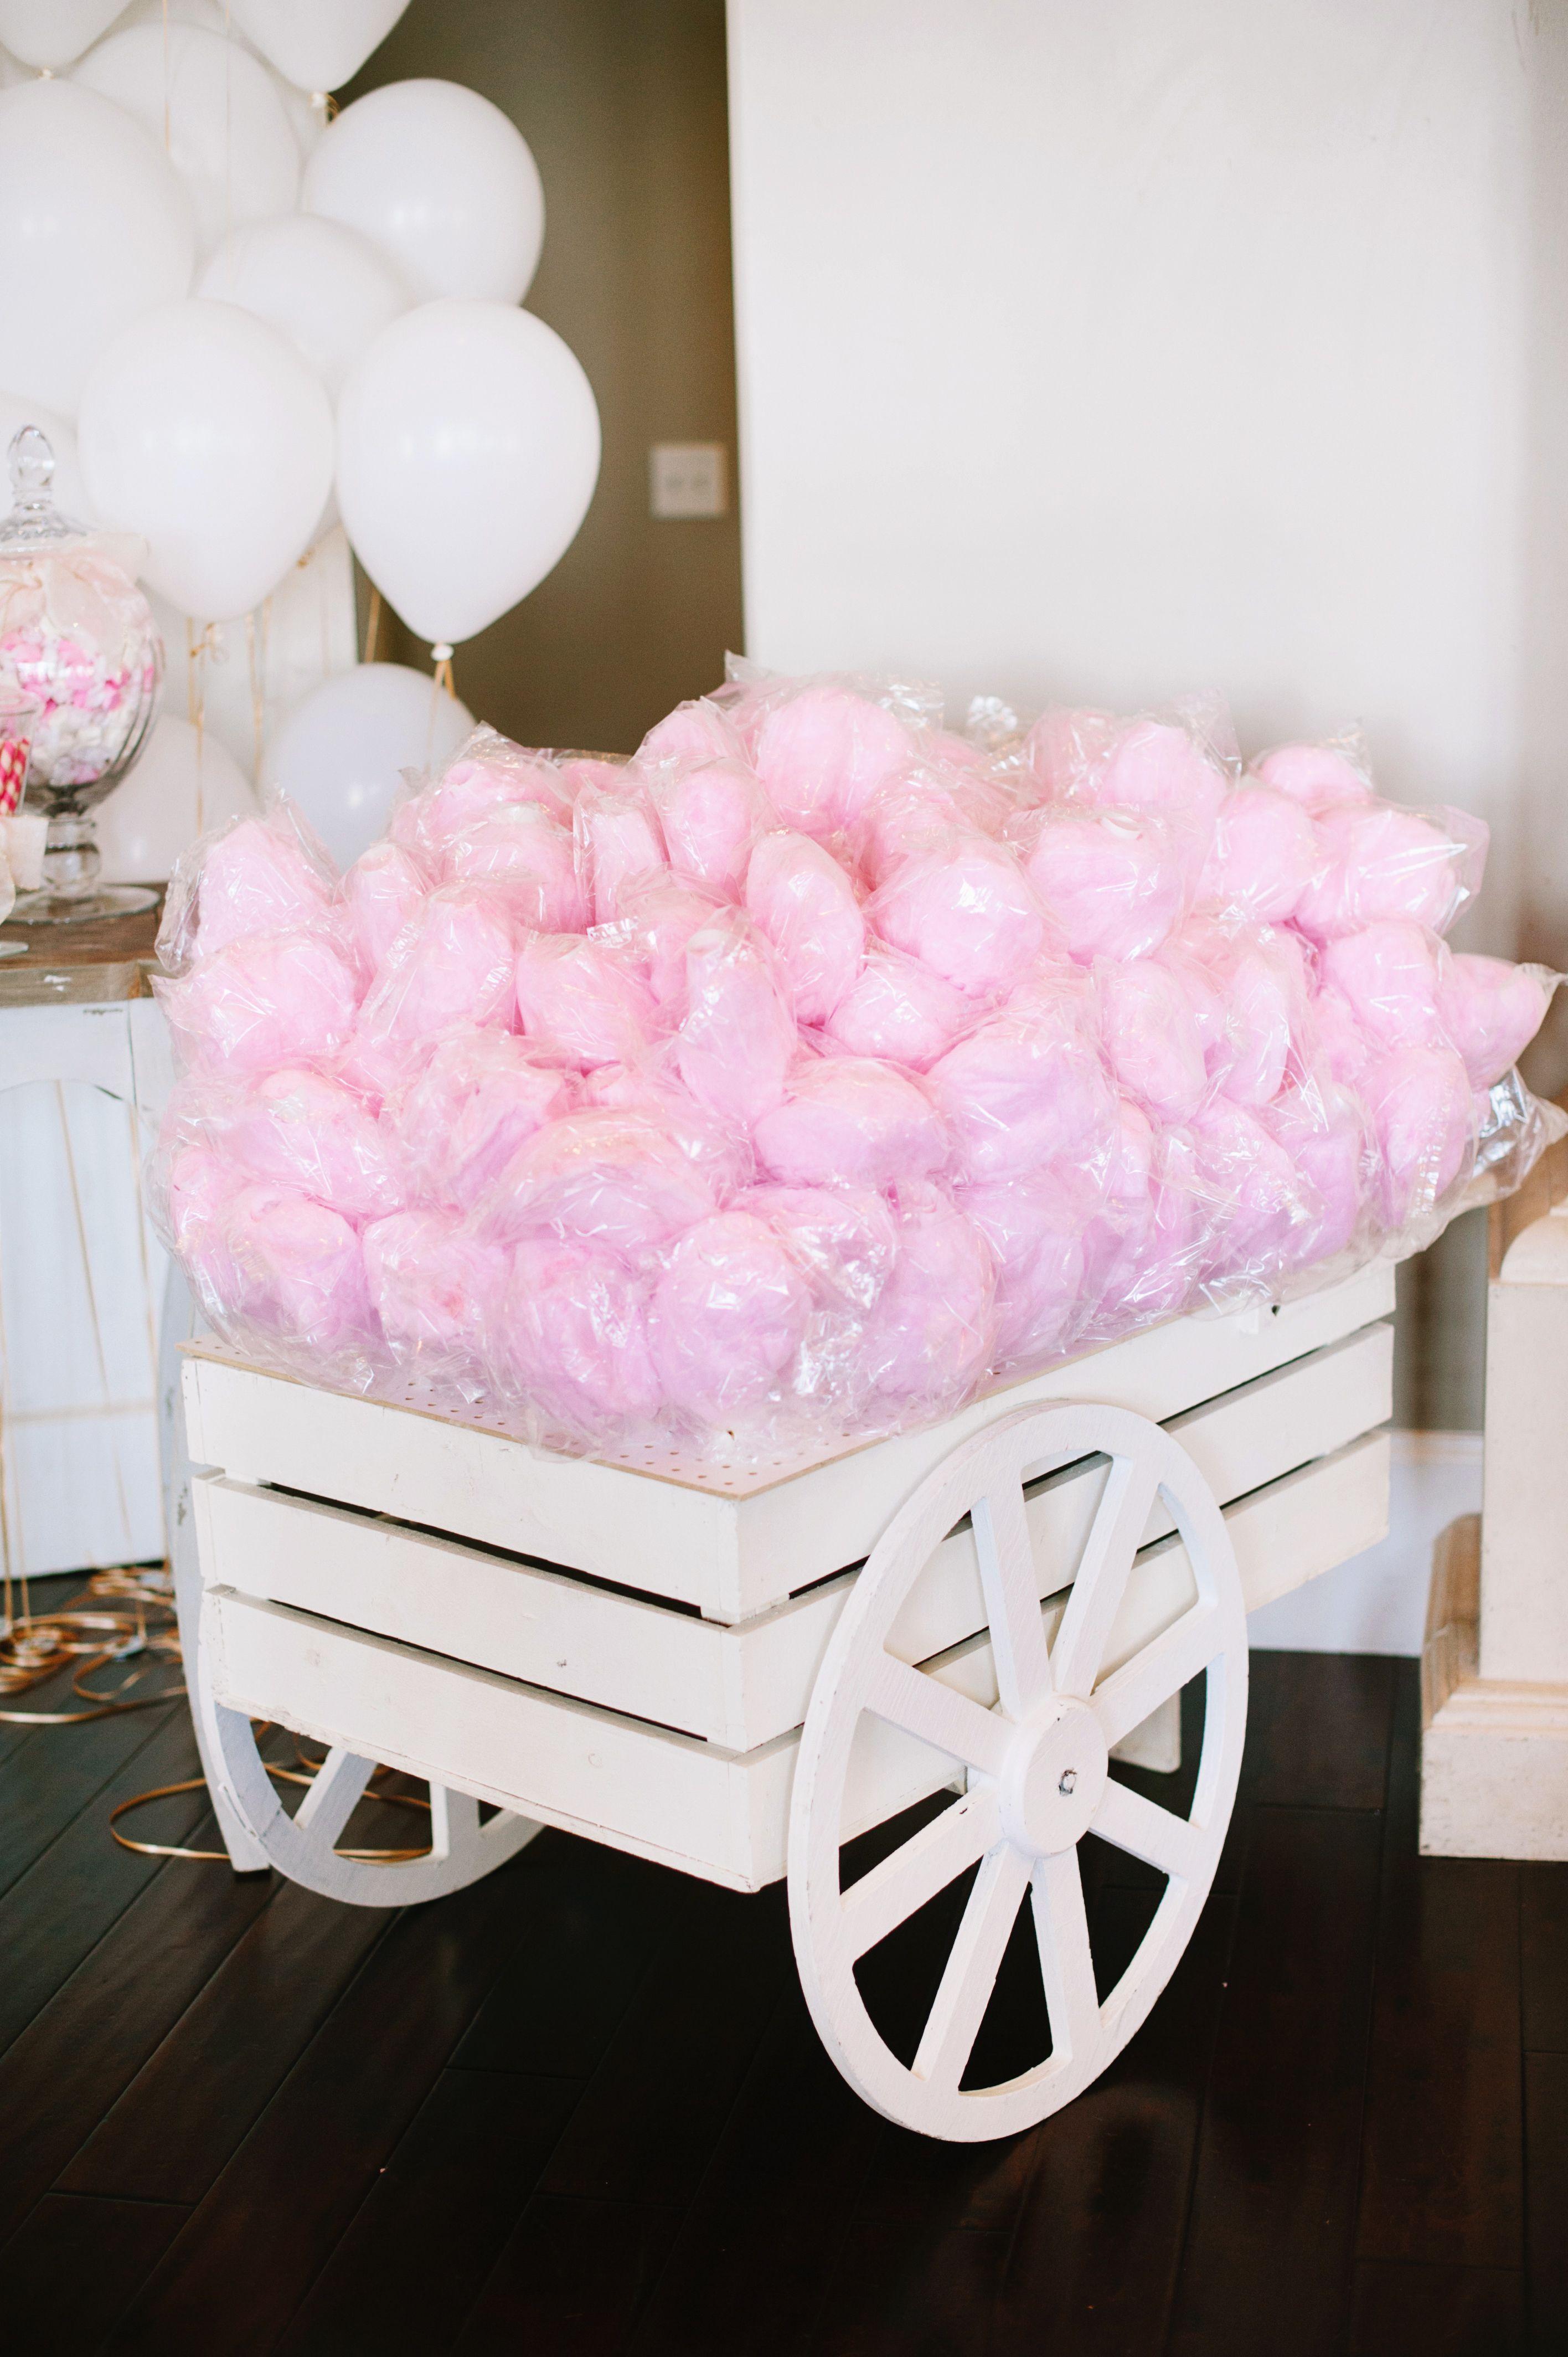 cotton candy treat bags | Barn Wedding Ideas | Pinterest | Cotton ...